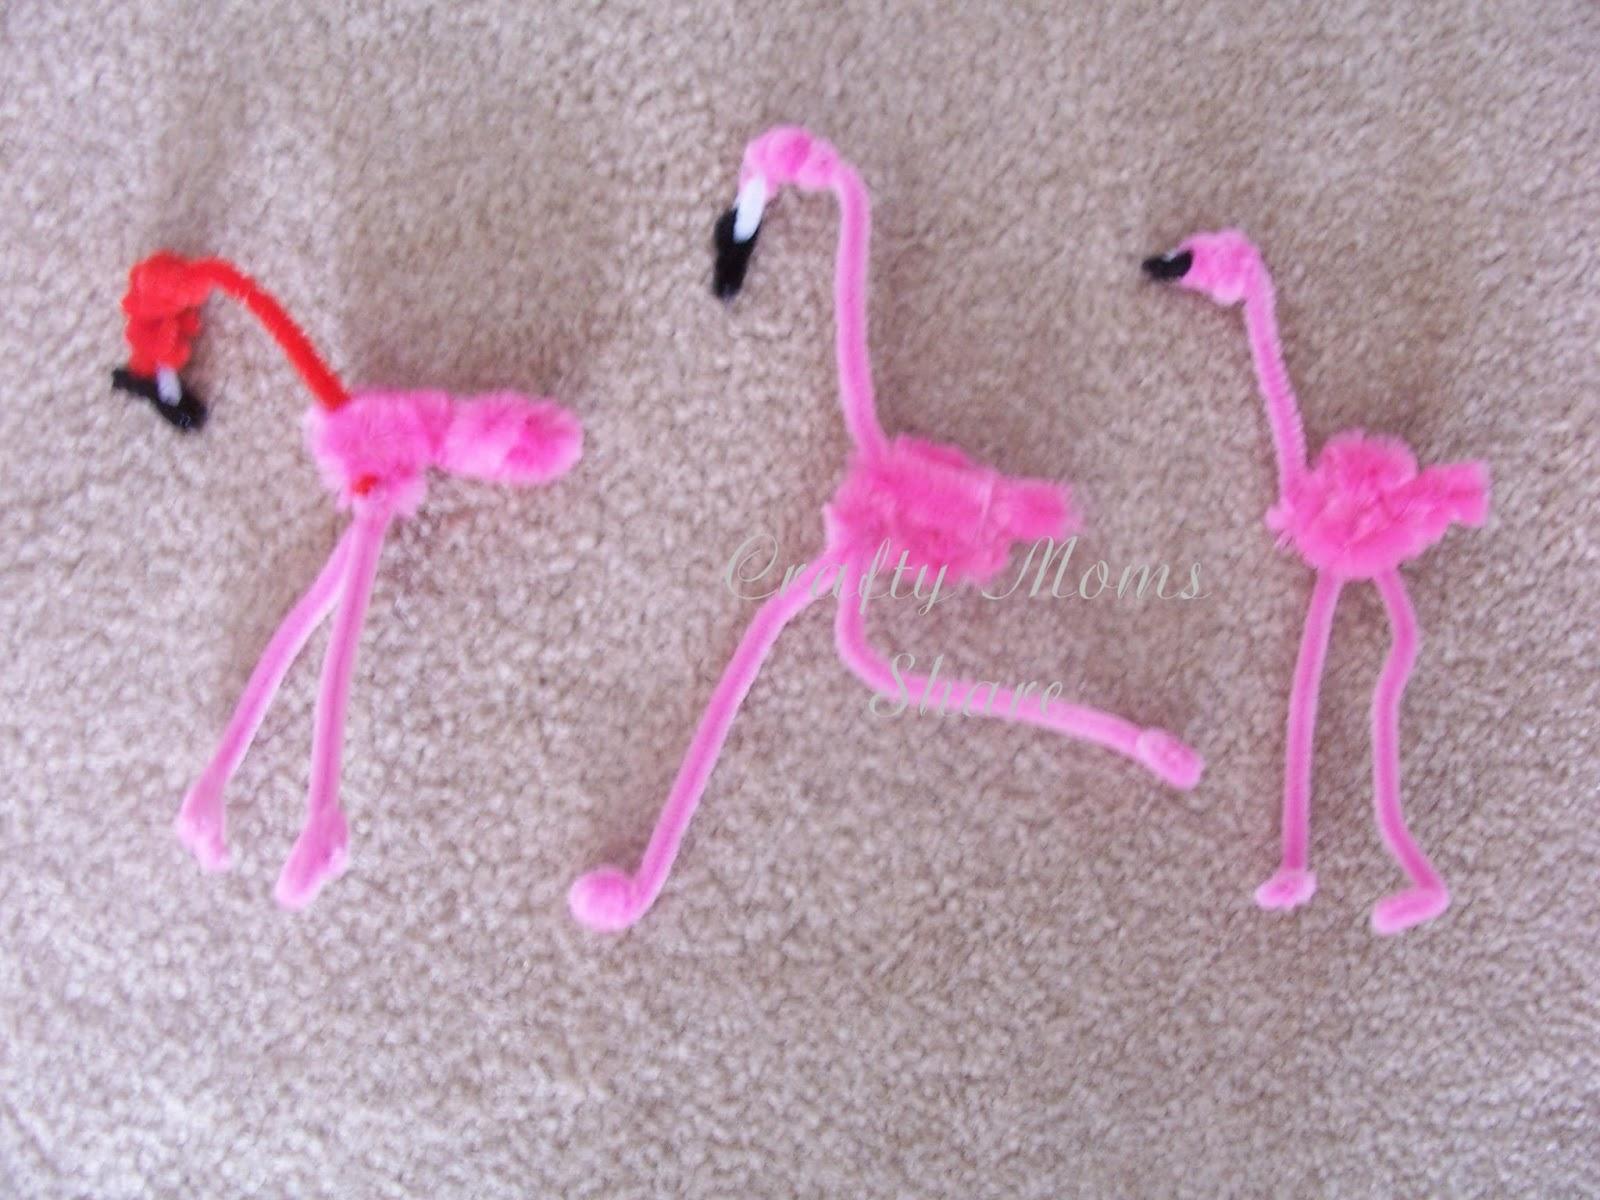 Thursday August 8 2013 & Crafty Moms Share: Flamingo Friday: Sylvie